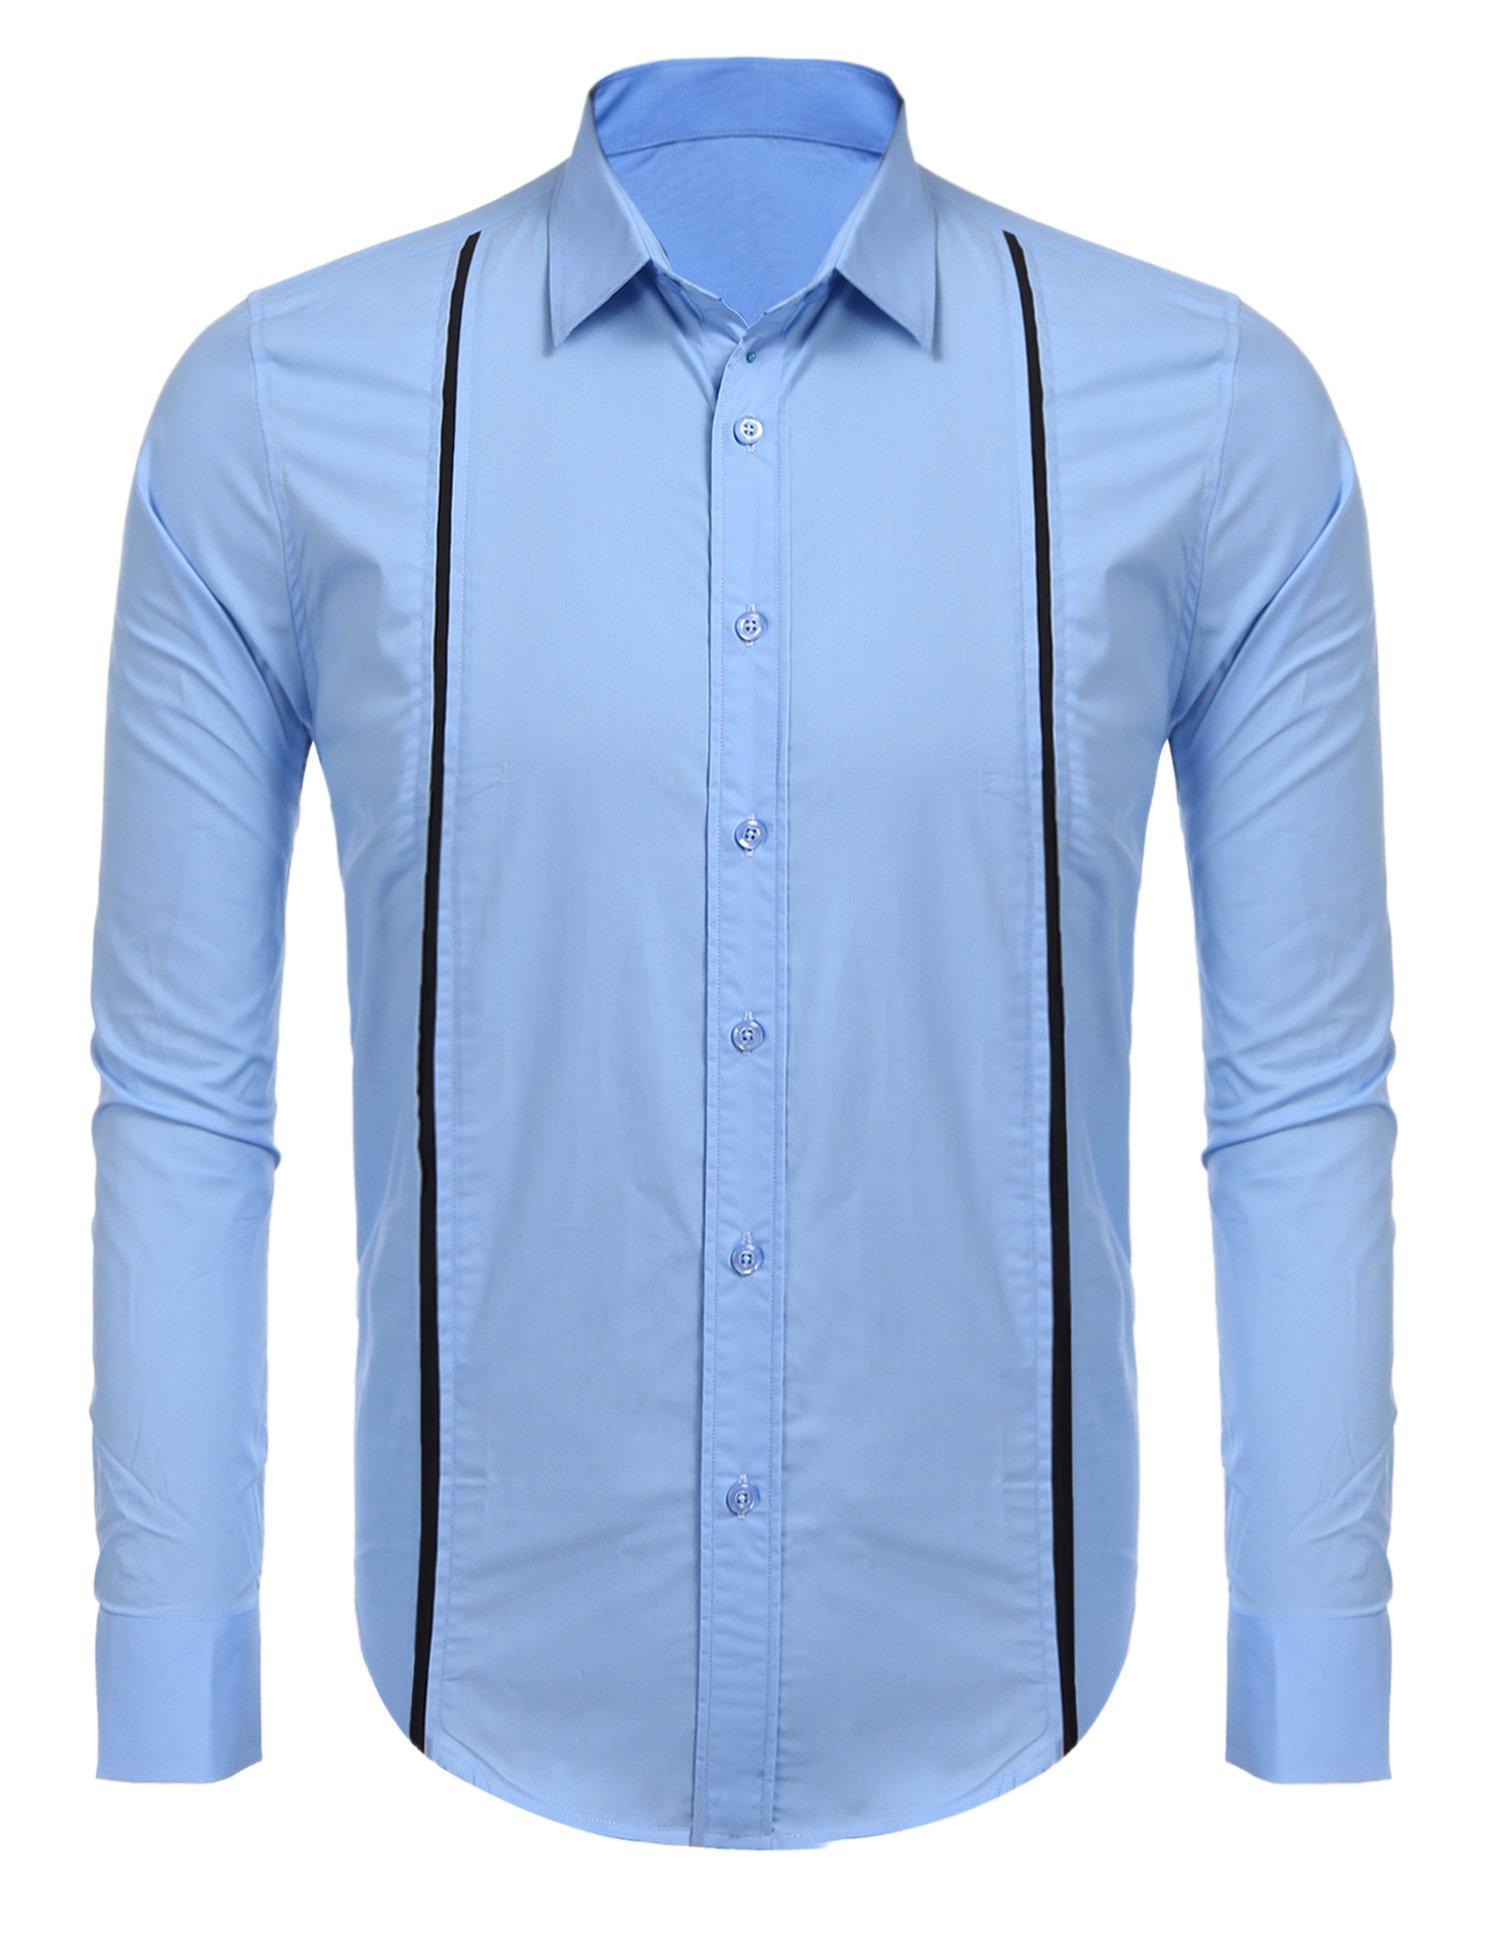 Simbama Mens Long Sleeves Contrast Stitching Button Down Guayabera Cuban Shirt